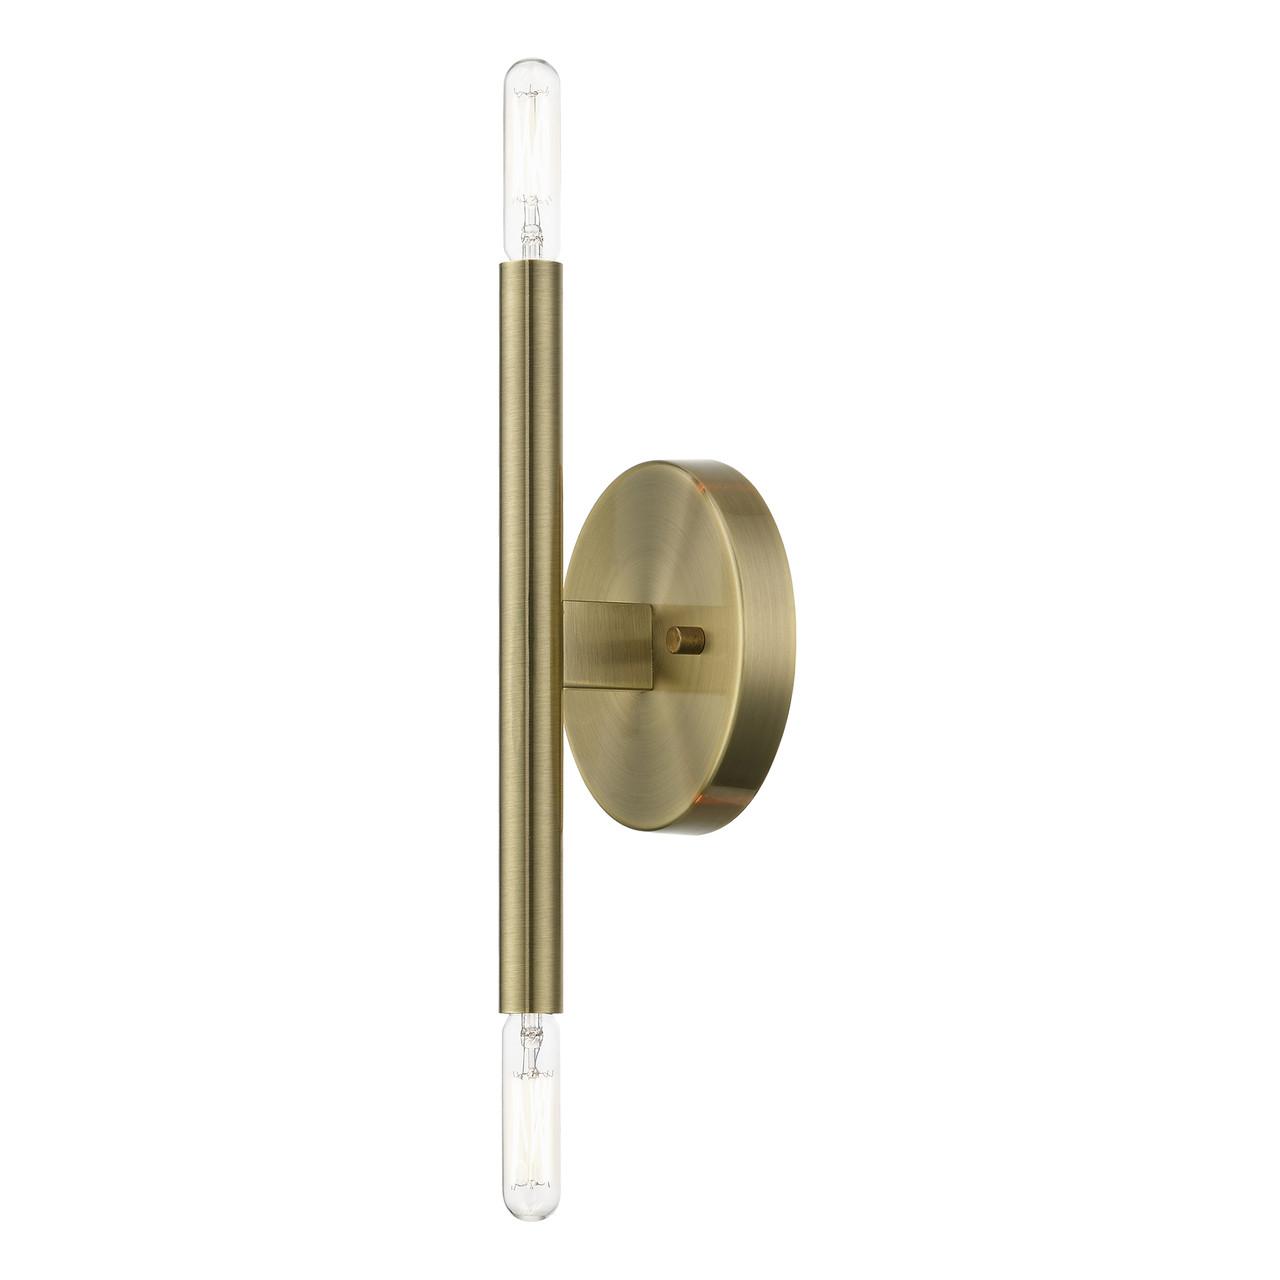 LIVEX LIGHTING 51172-01 Antique Brass ADA 2-Llght Wall Sconce Antique Brass